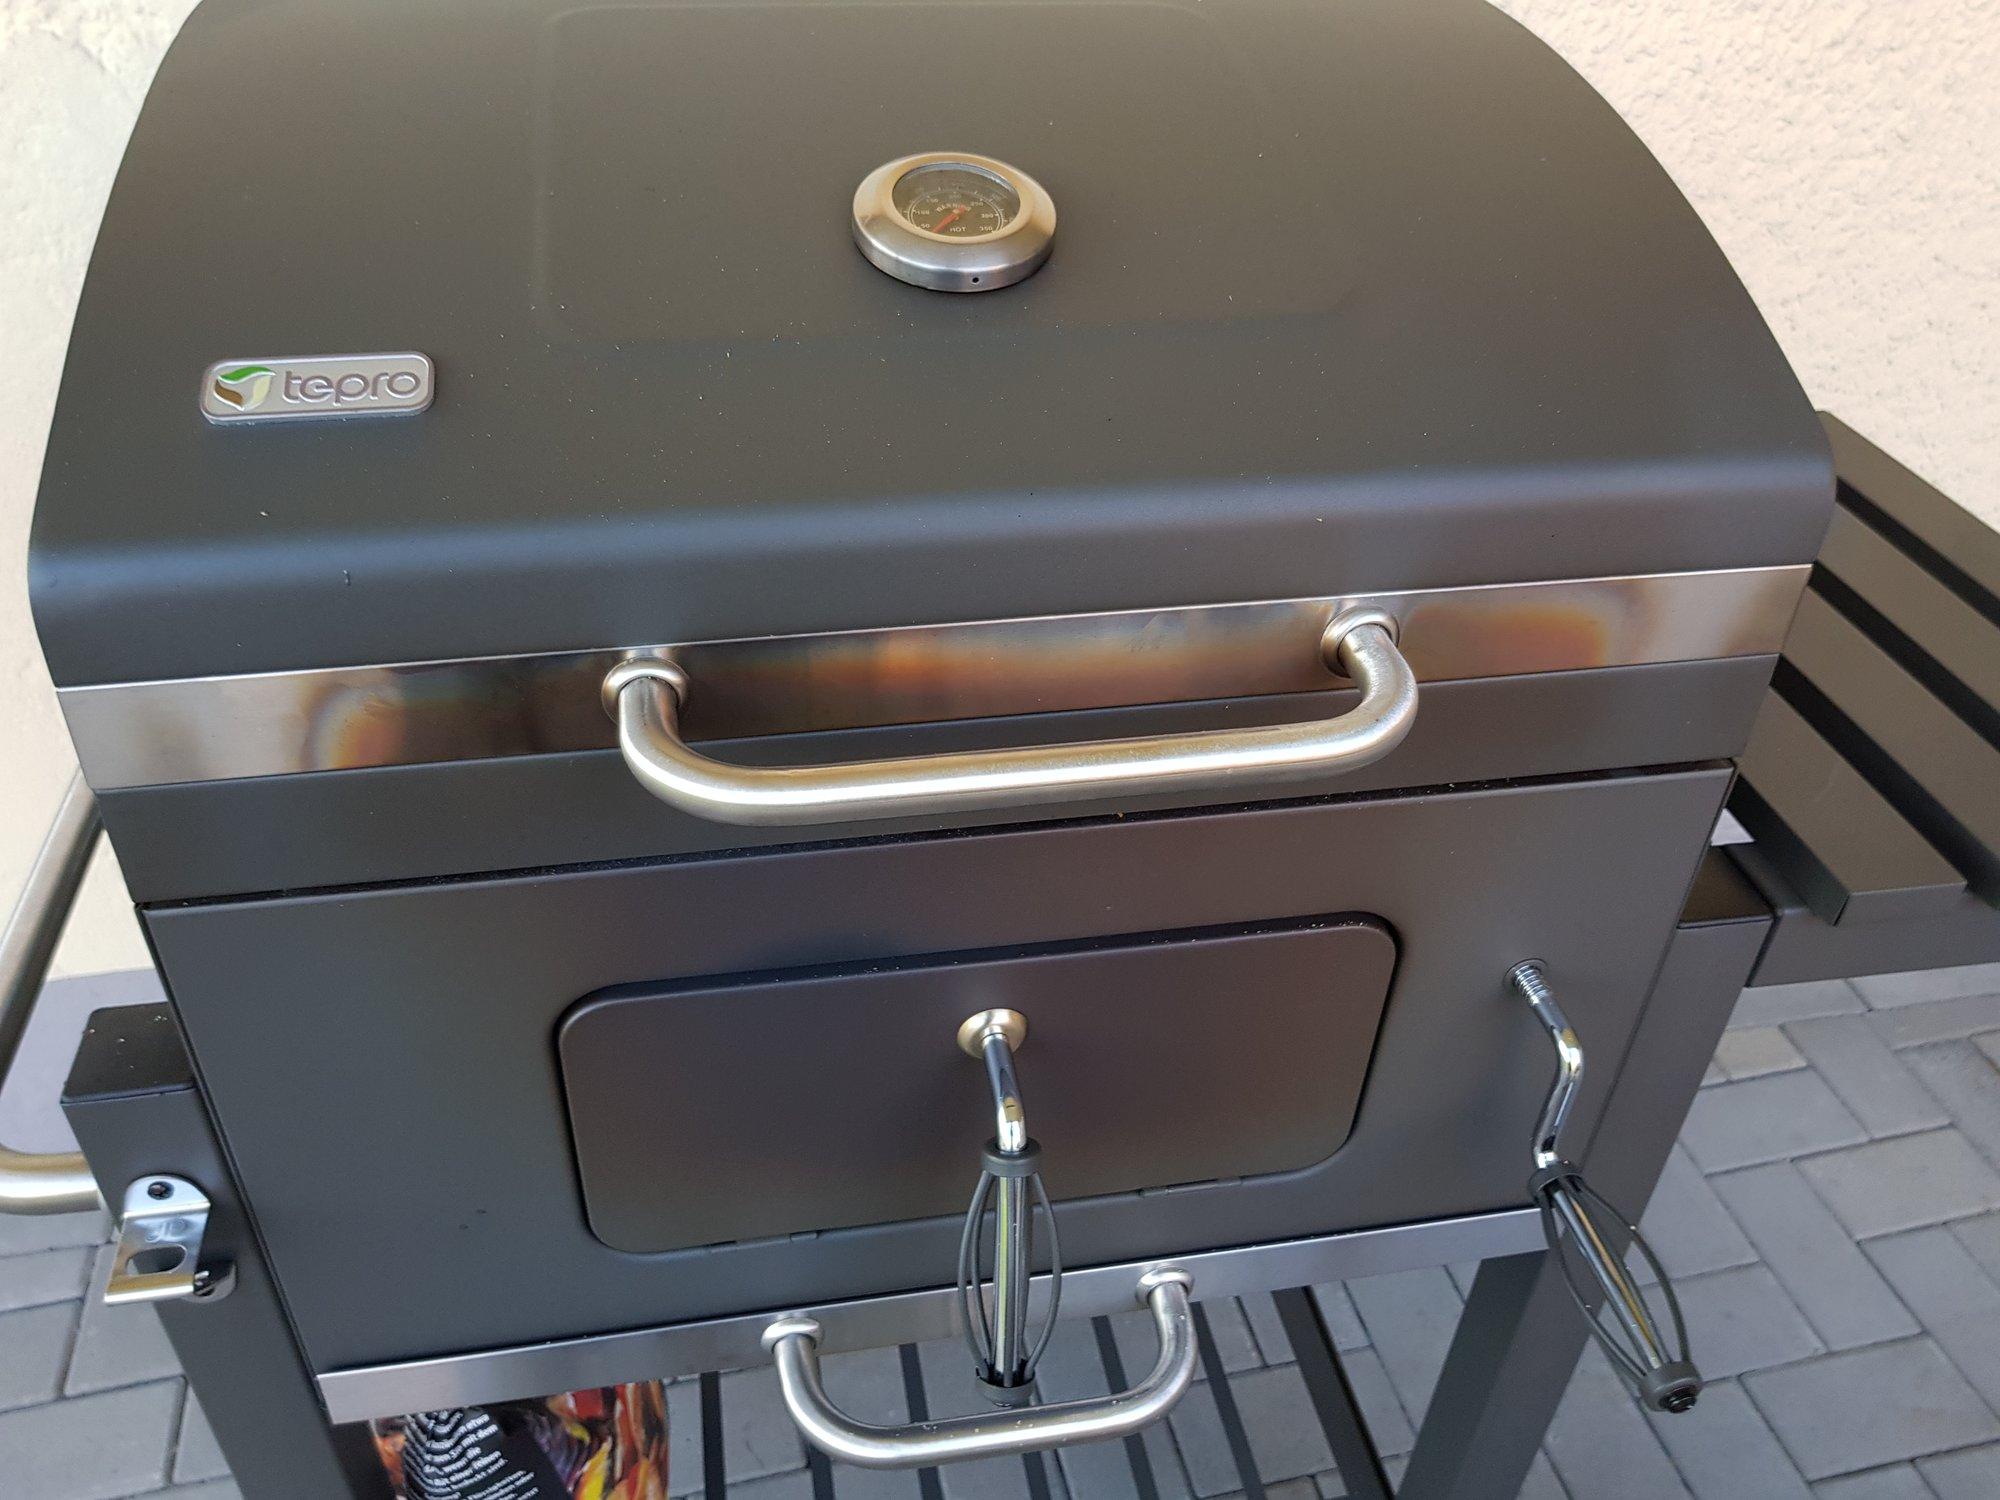 Tepro Toronto Holzkohlegrill Bauanleitung : Klassiker tepro toronto holzkohlegrill grill testbericht